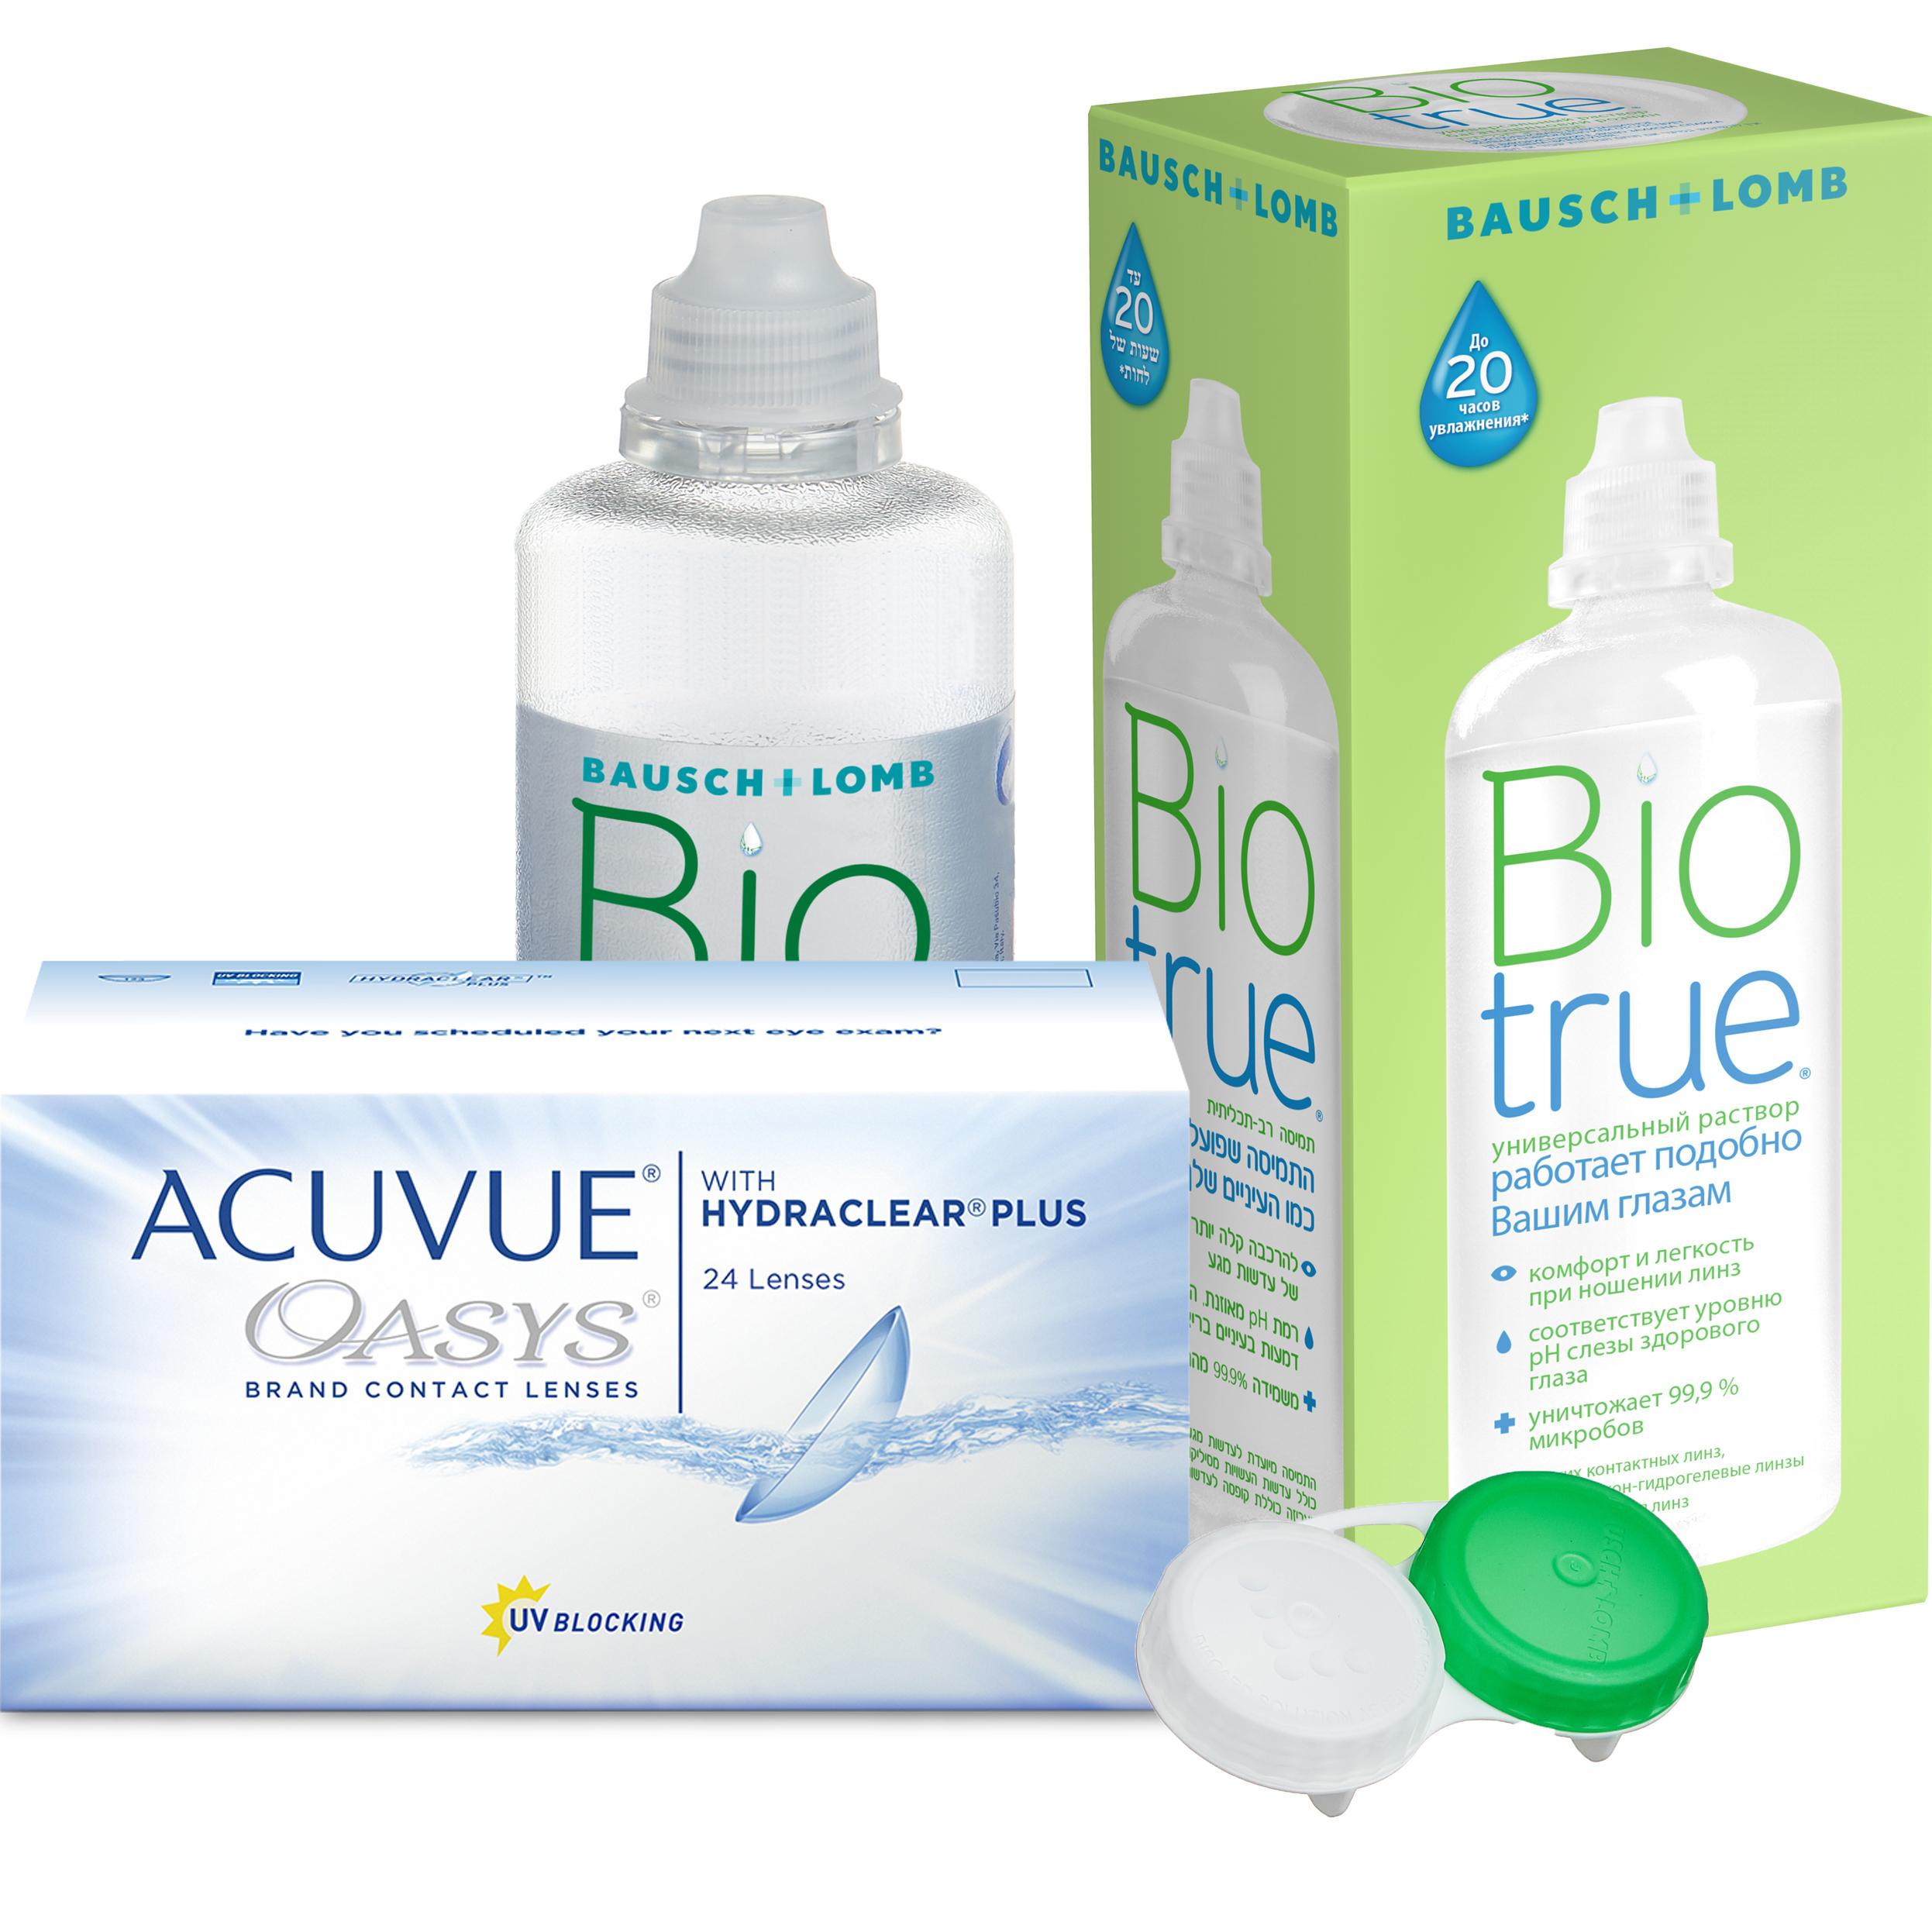 Купить Oasys with Hydraclear Plus 24 линзы + Biotrue, Контактные линзы Acuvue Oasys with Hydraclear Plus 24 линзы R 8.4 +4, 75 + Biotrue 300 мл